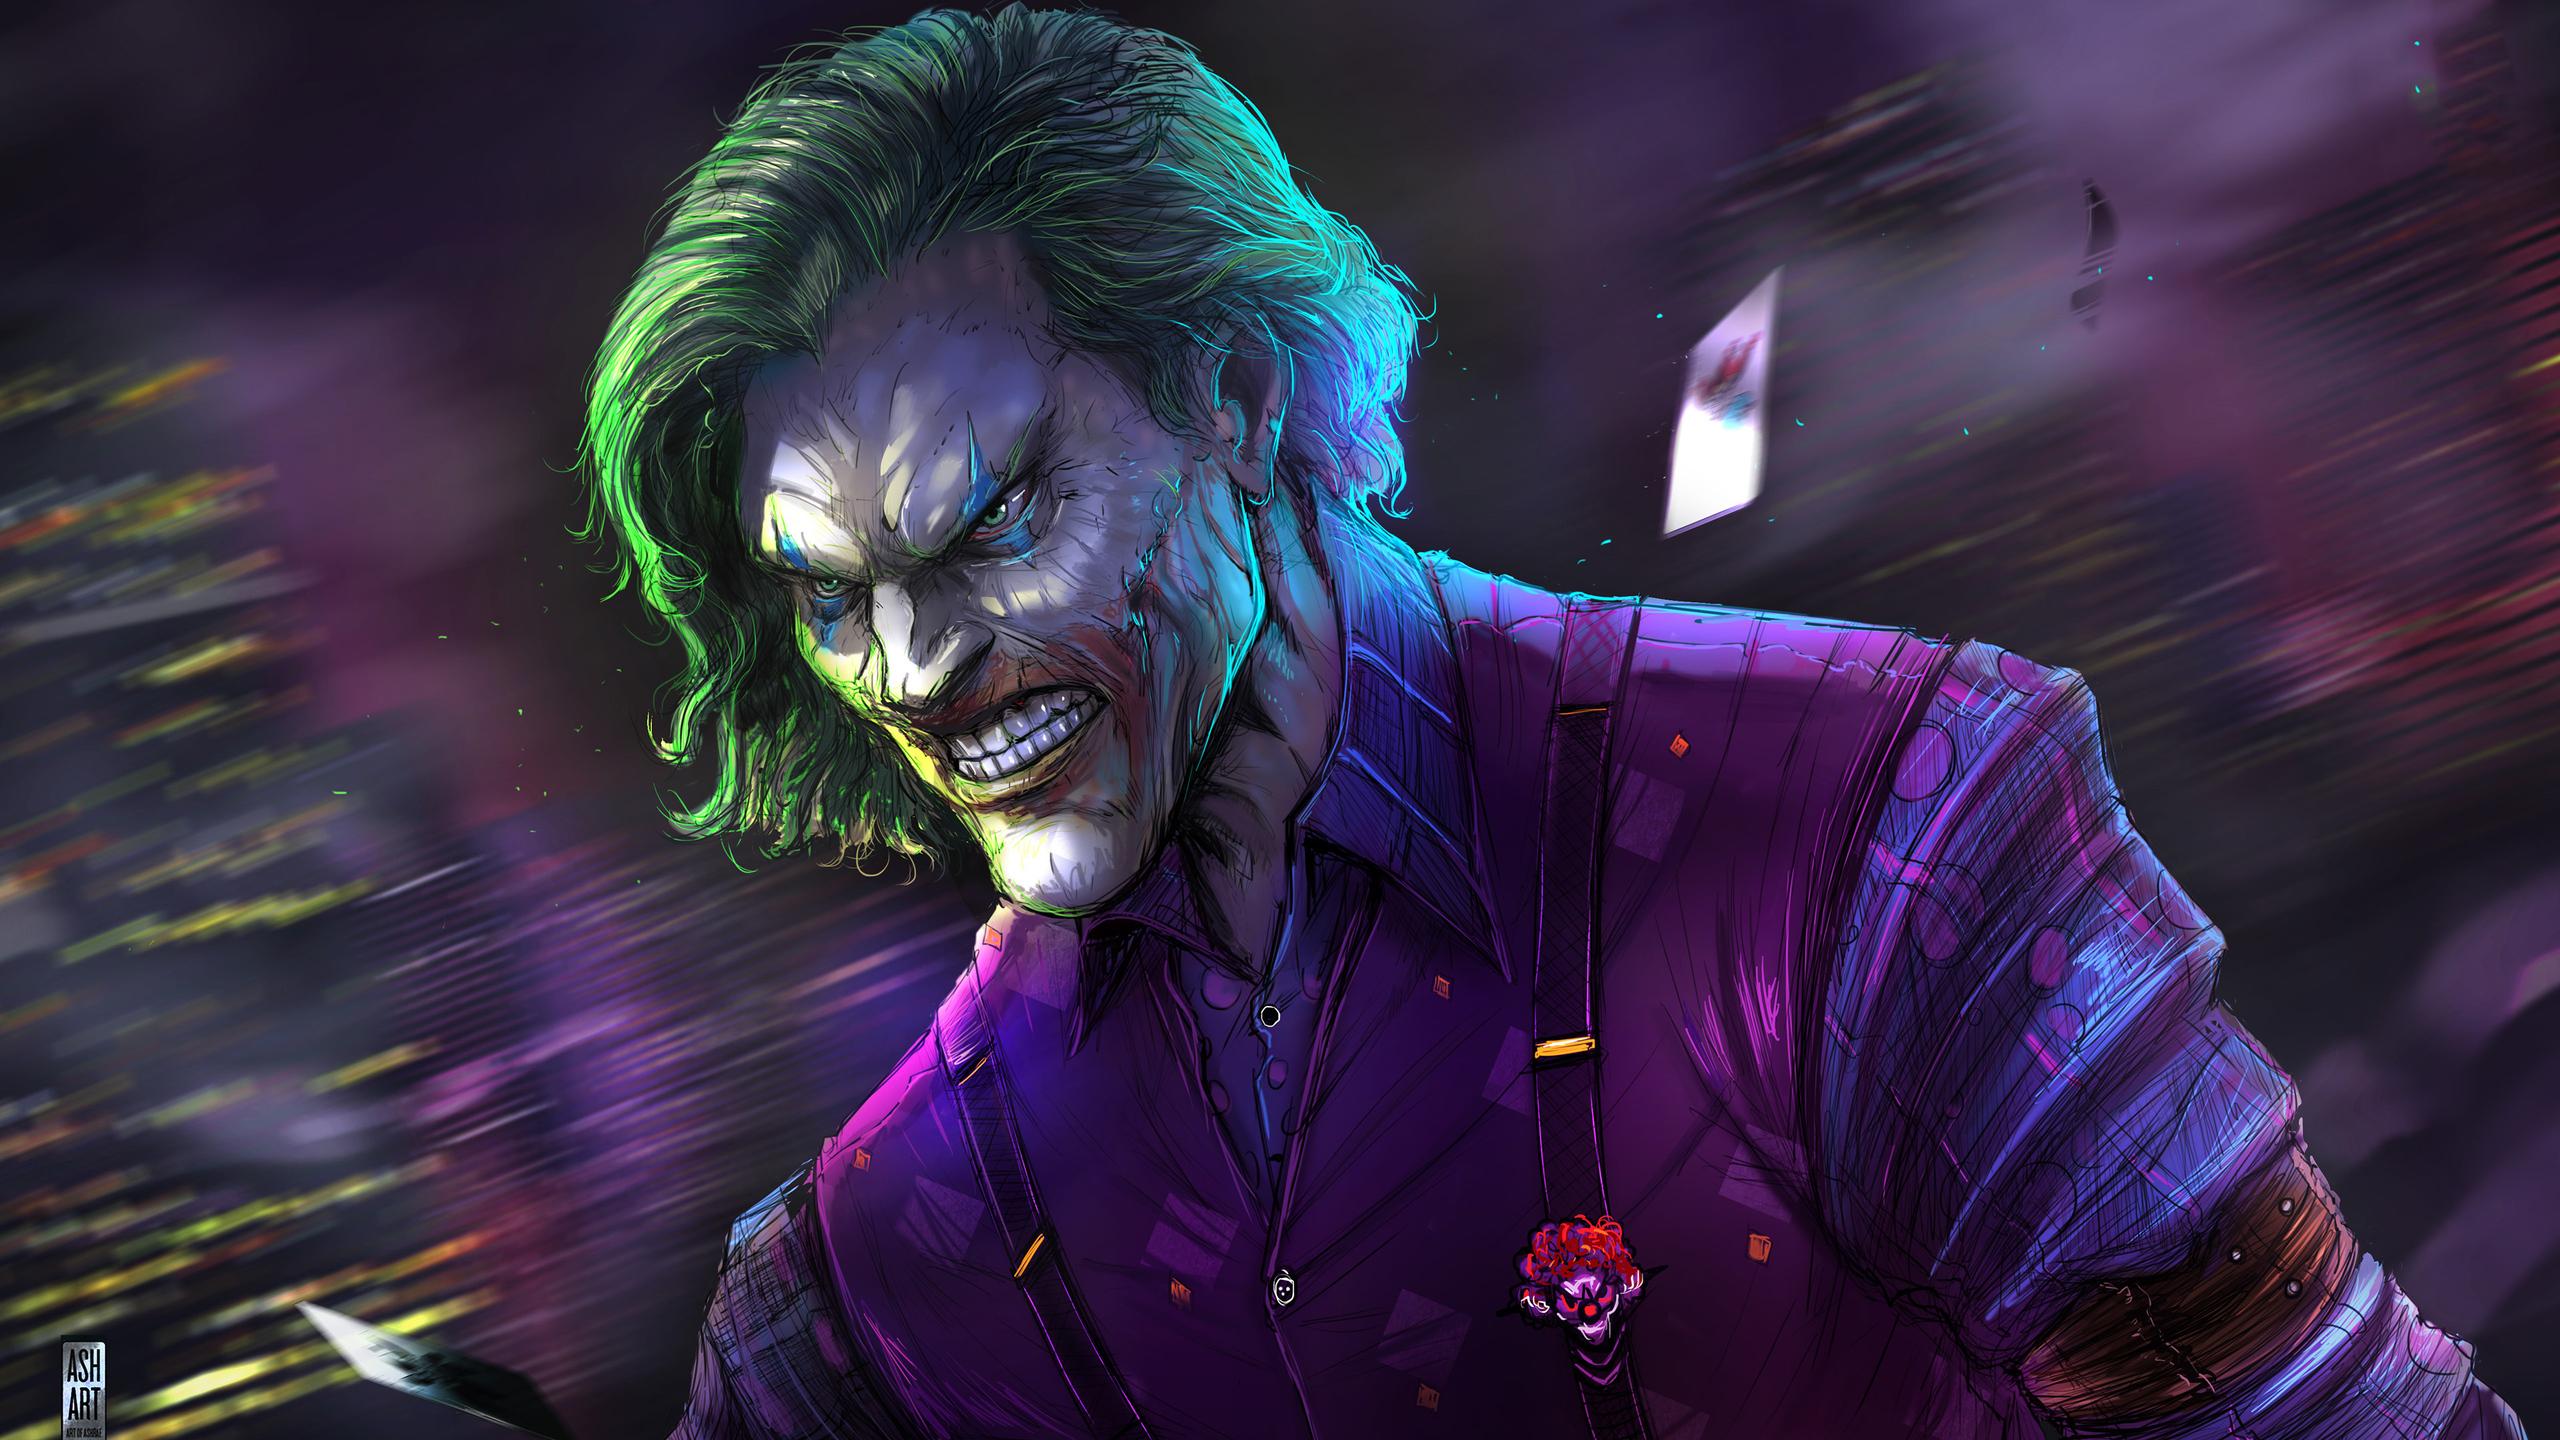 2560x1440 Joker Artwork 4k 2019 1440p Resolution Hd 4k